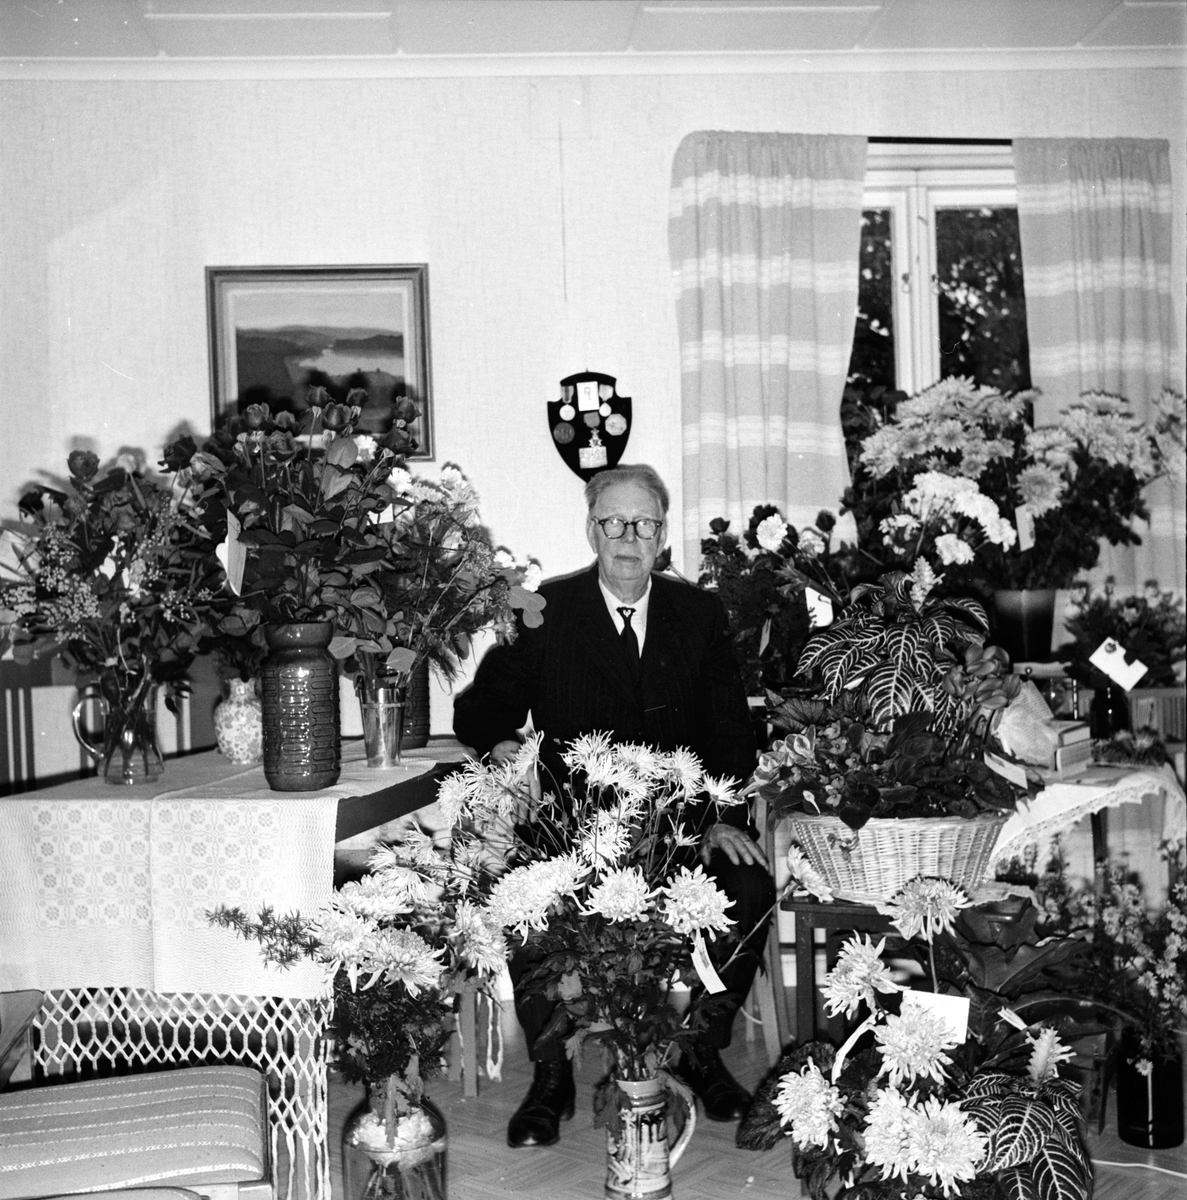 Arbrå, Gottfrid Fröderbergs 80-årsdag, 24 Oktober 1967